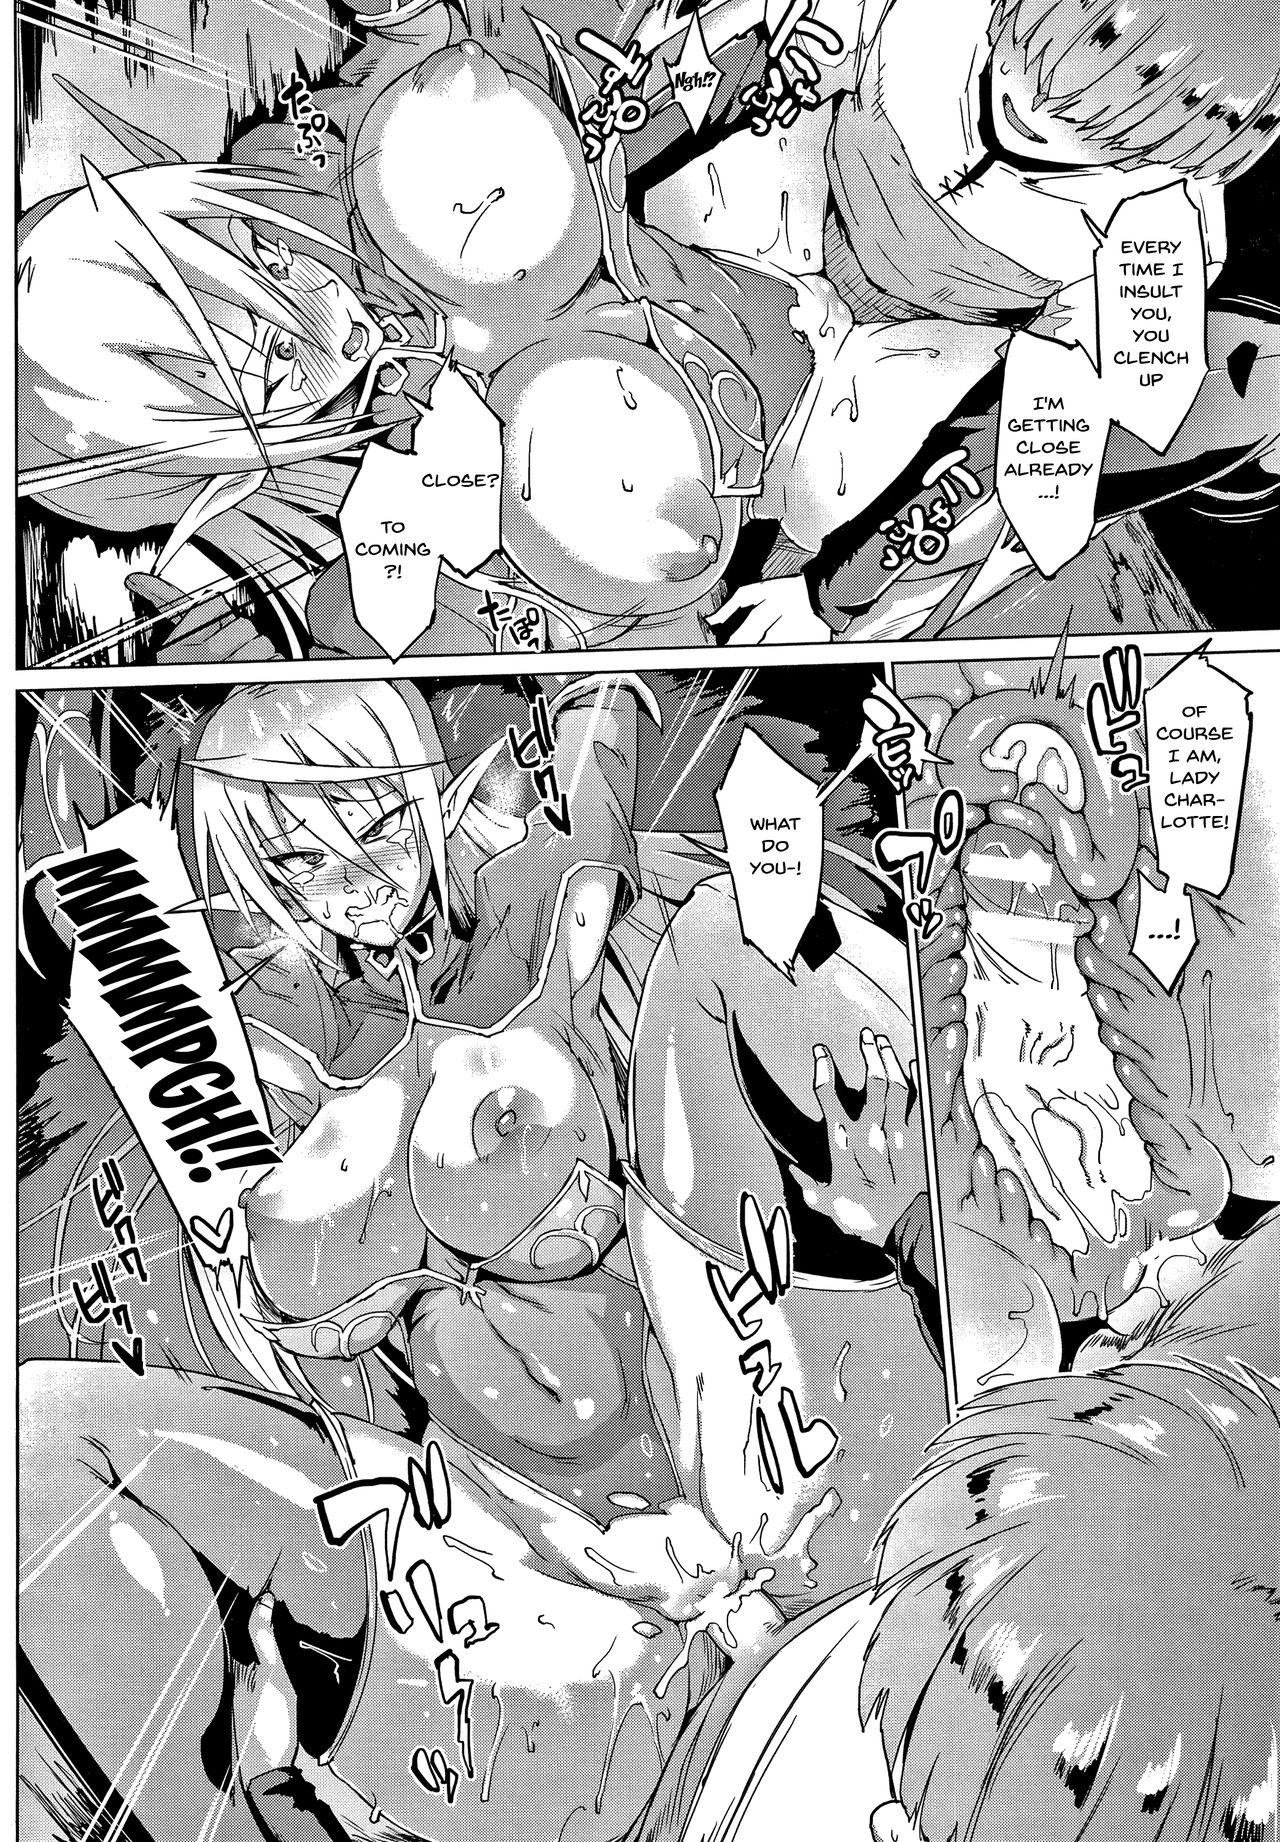 [Fan no Hitori] Sennen Reijou ~ My Lady, My Master ~  Ch.1-3 [English] {Doujins.com} 16